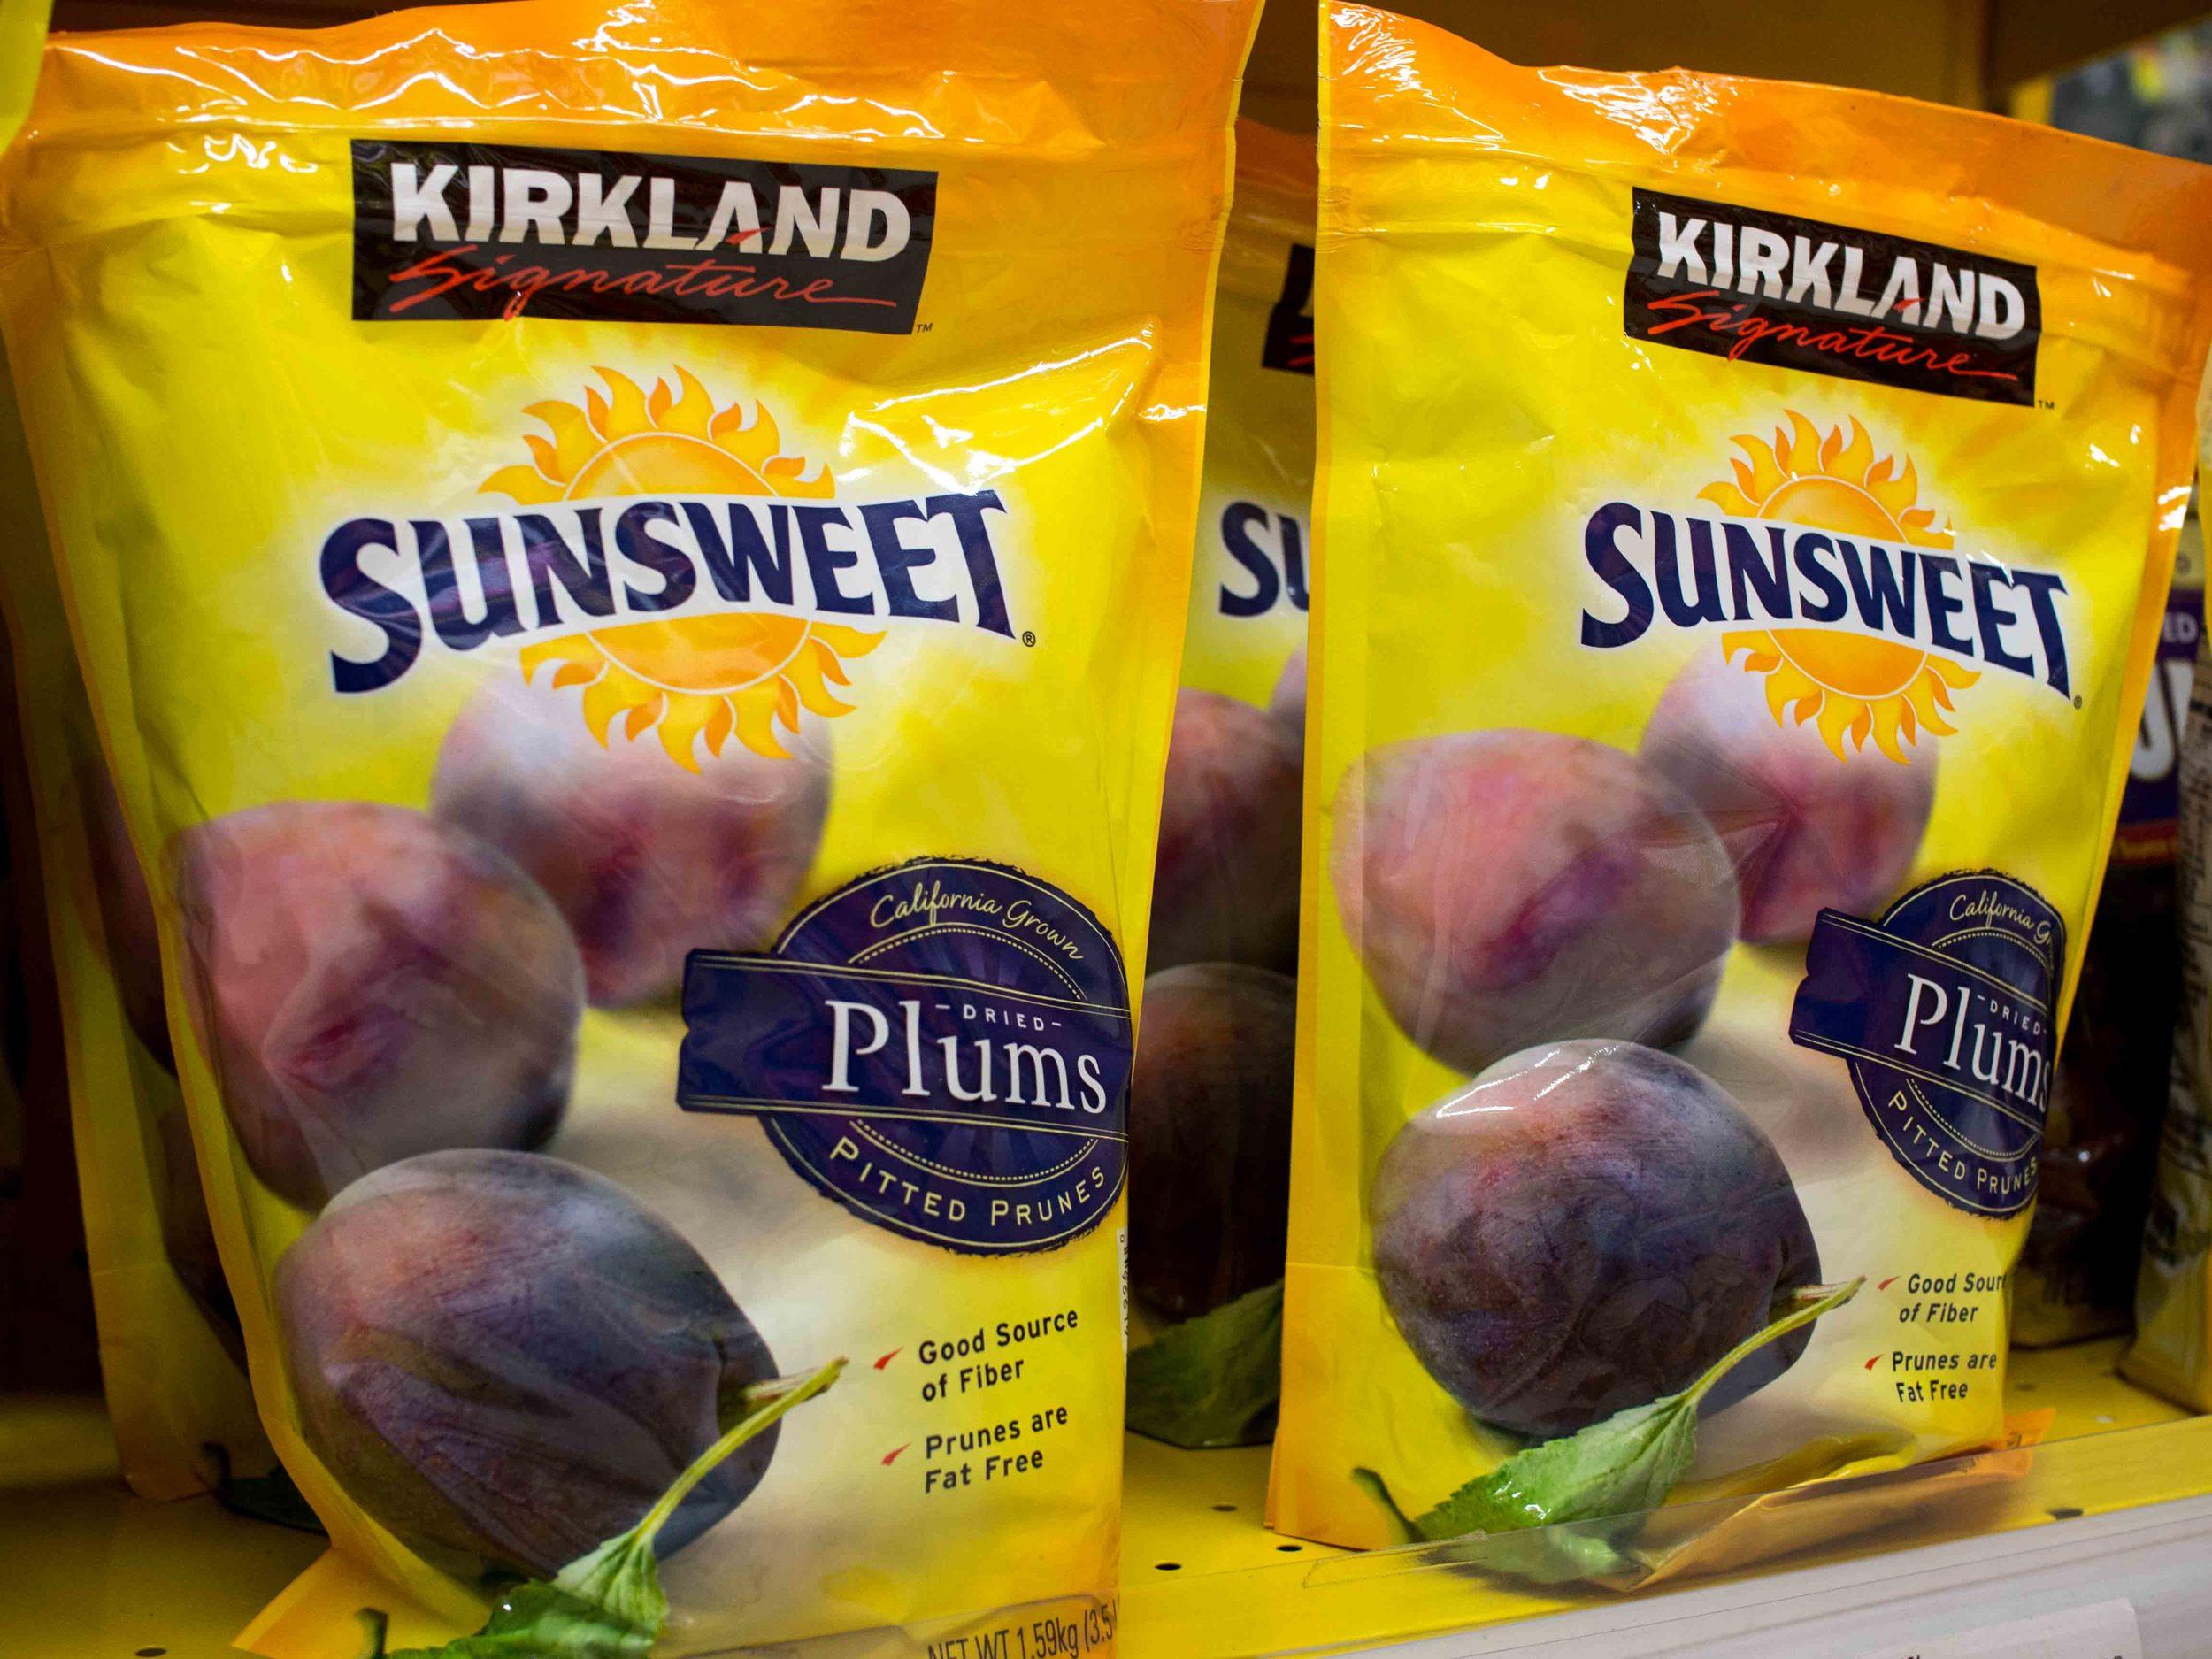 Kirkland Sunsweet Plums